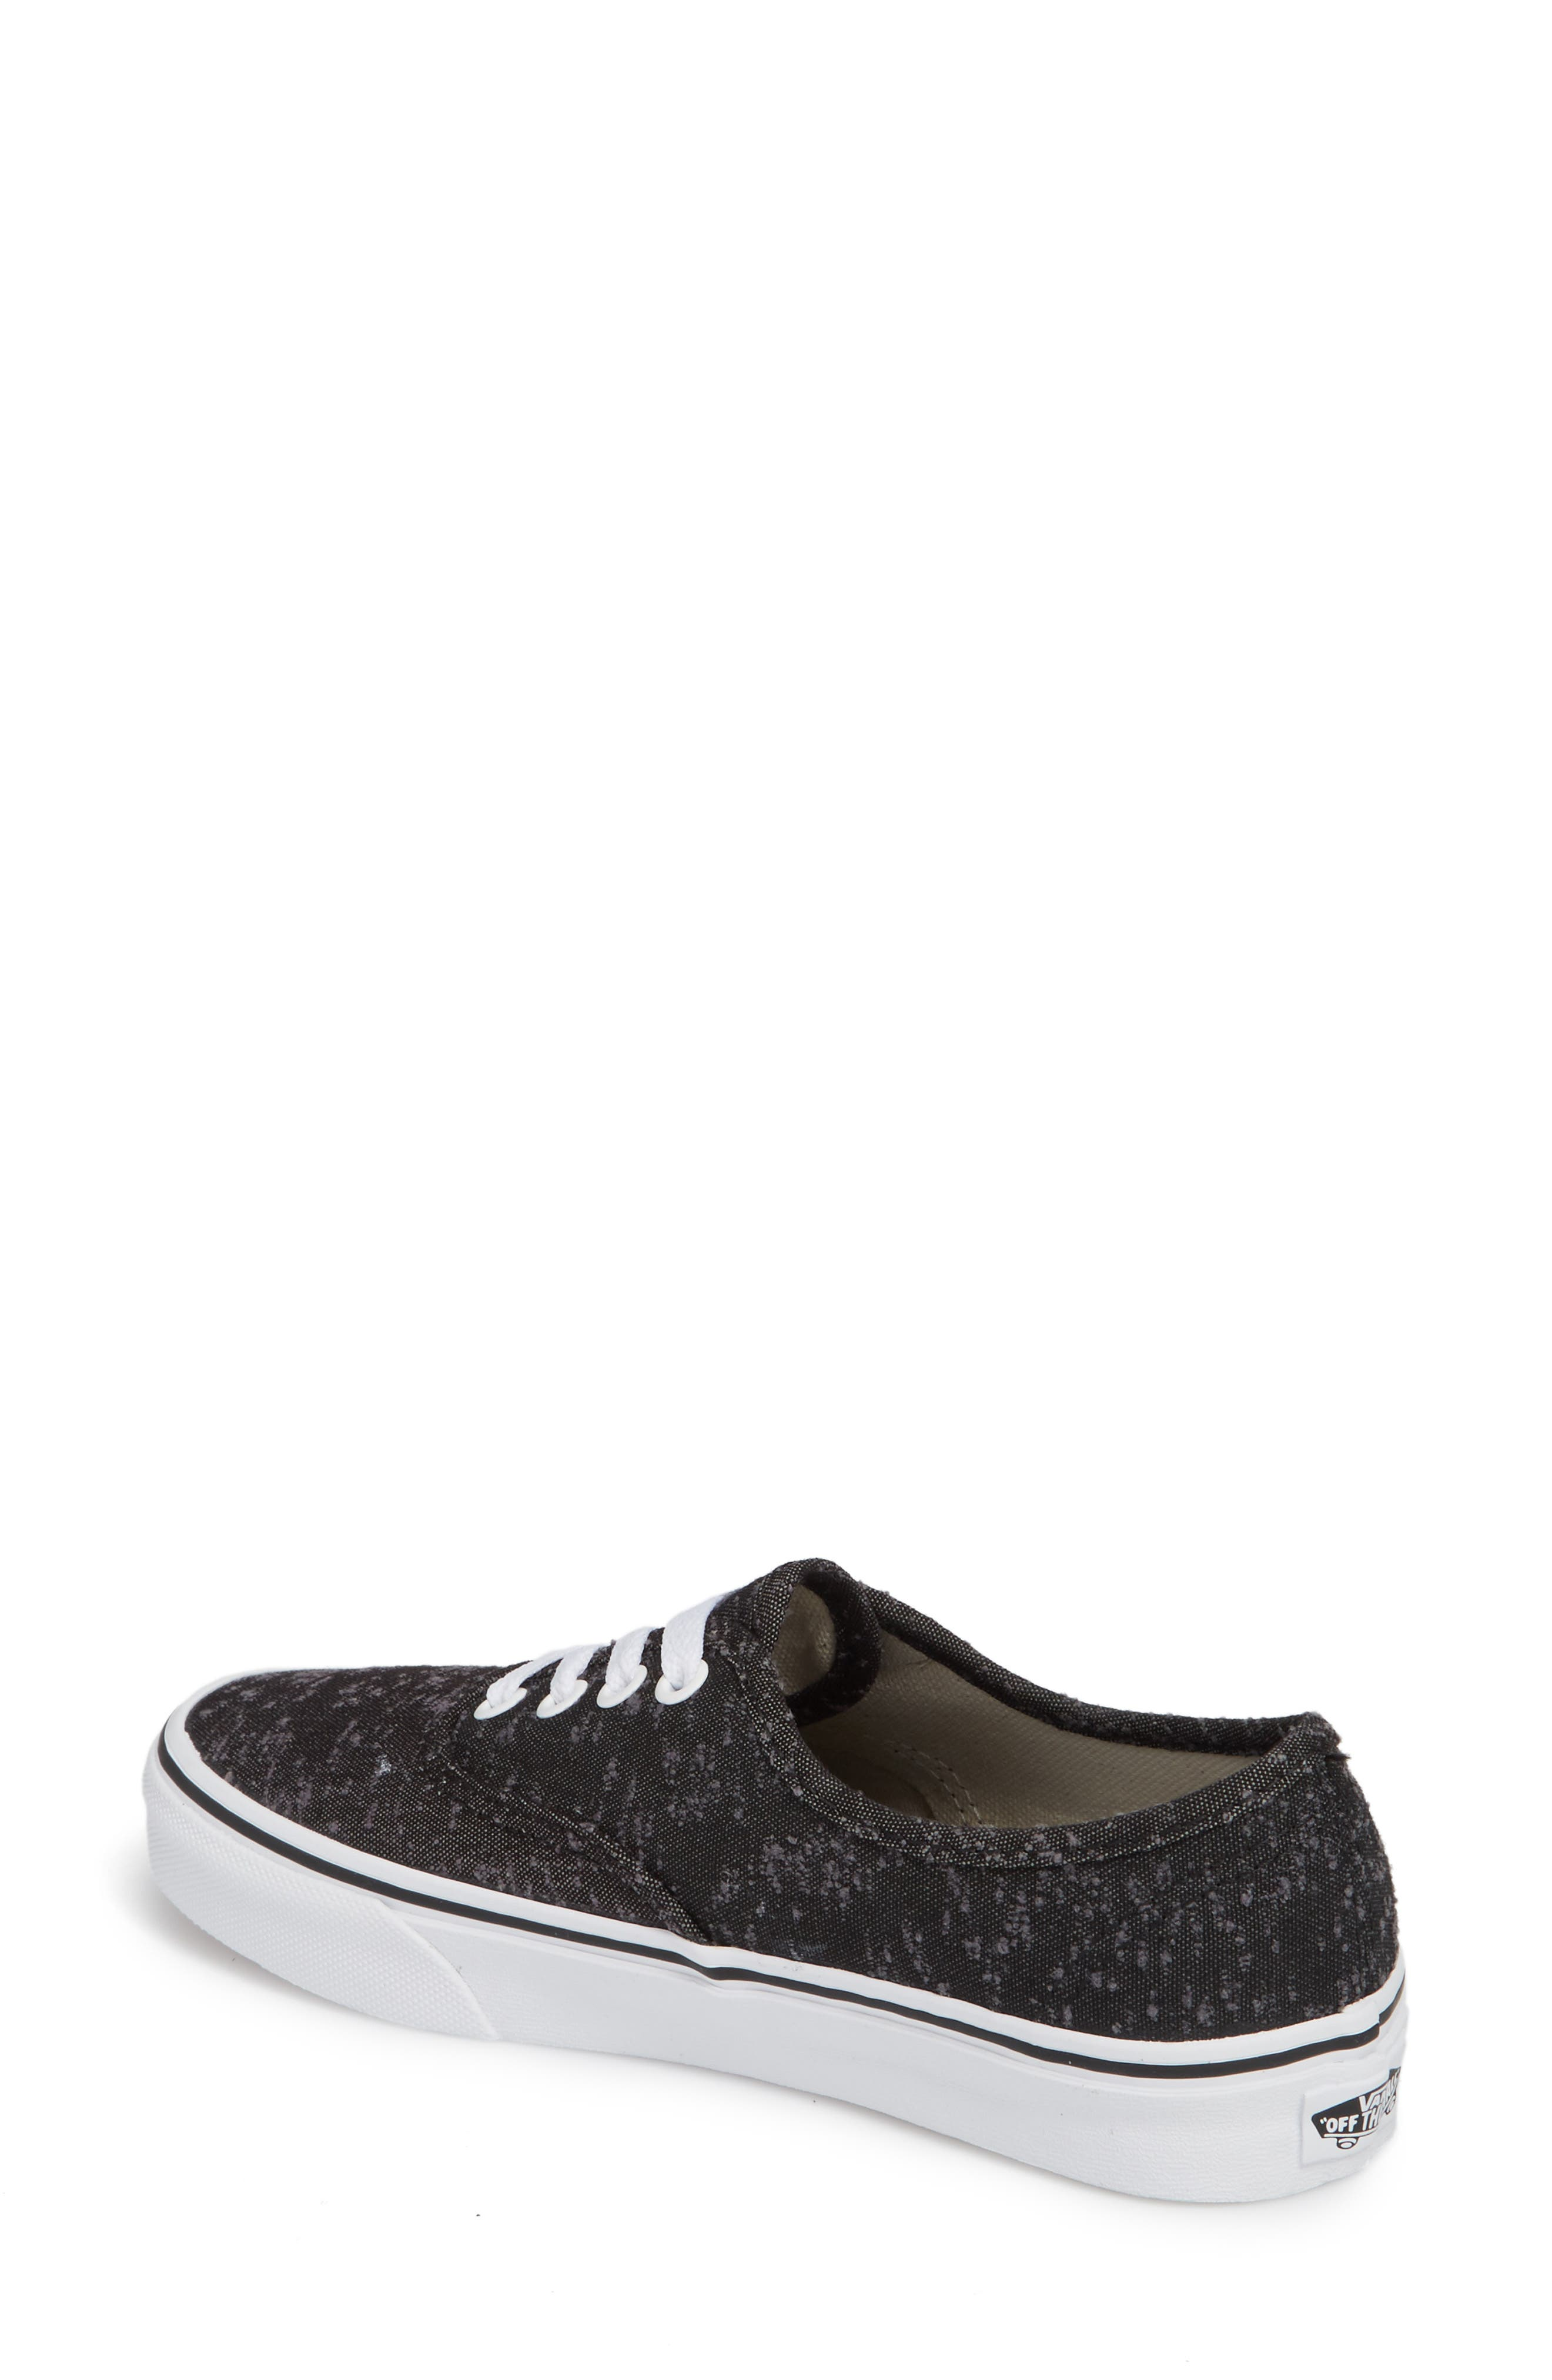 ,                             'Authentic' Sneaker,                             Alternate thumbnail 67, color,                             005